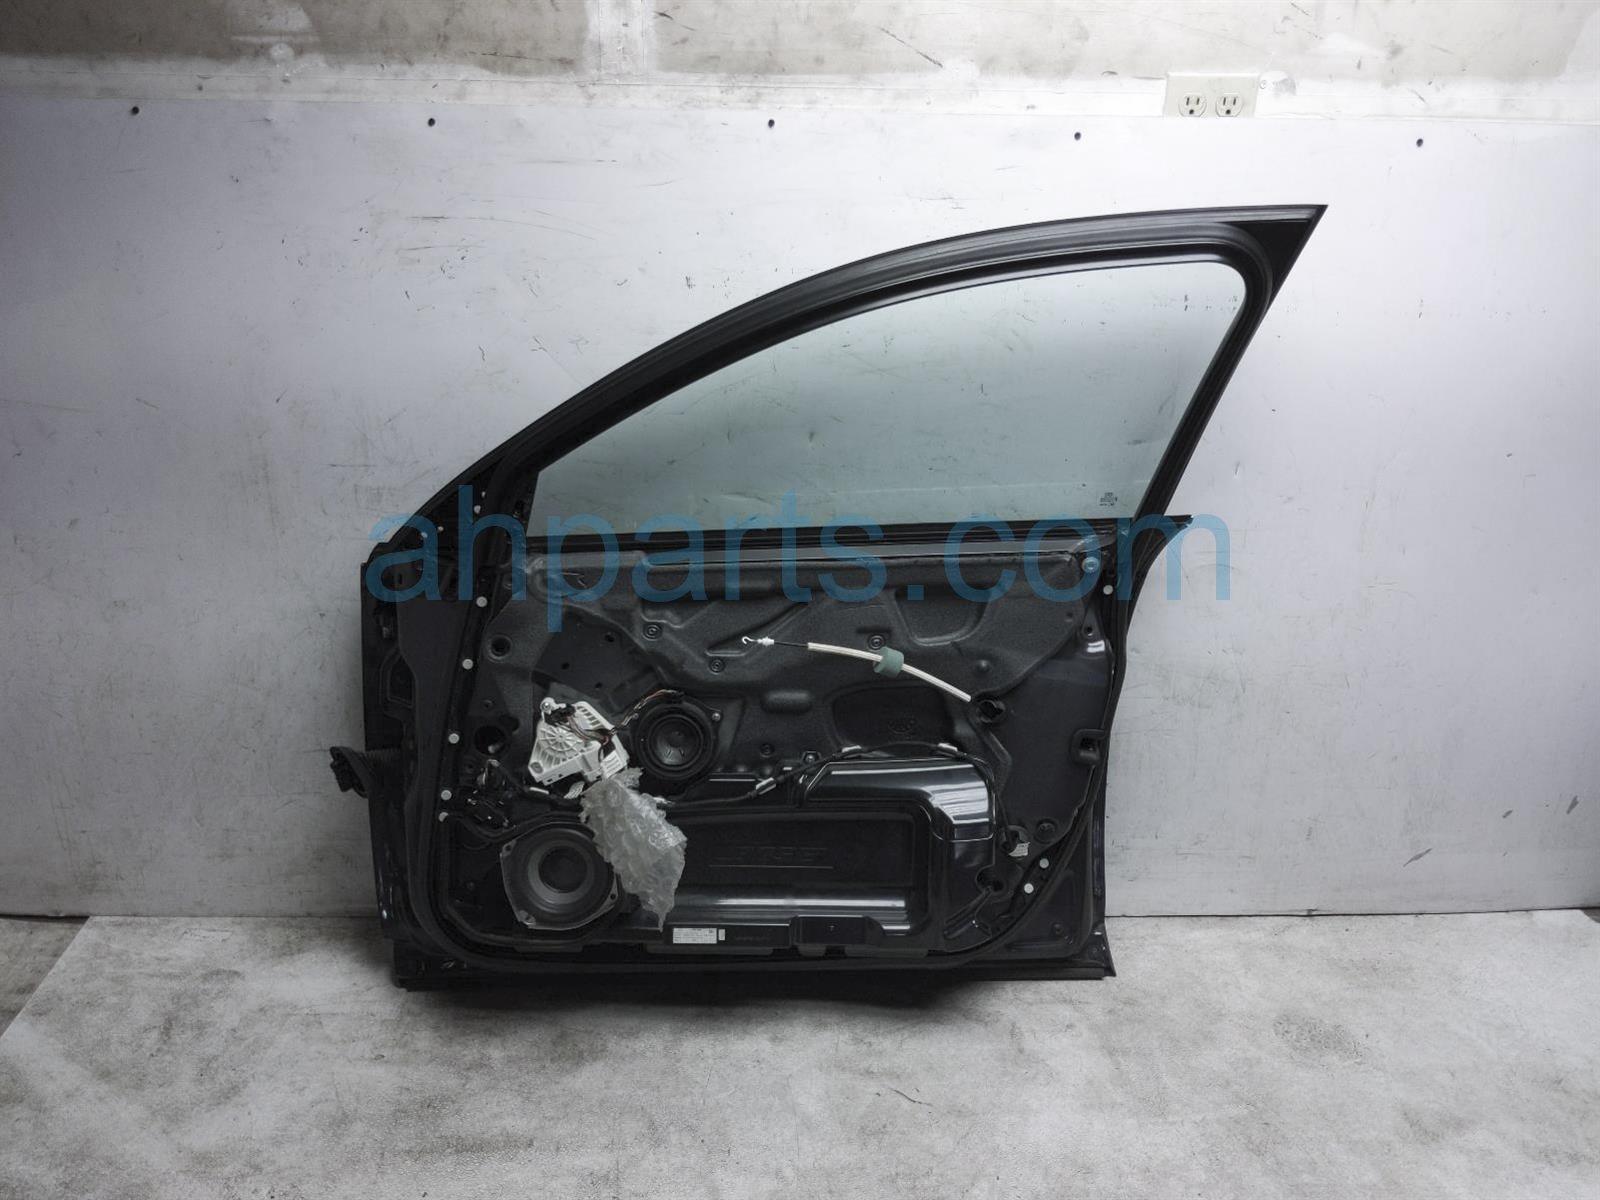 2011 Audi A6 Audi Front Passenger Door   Blue   No Mirror/trim 4F0 831 052 F Replacement